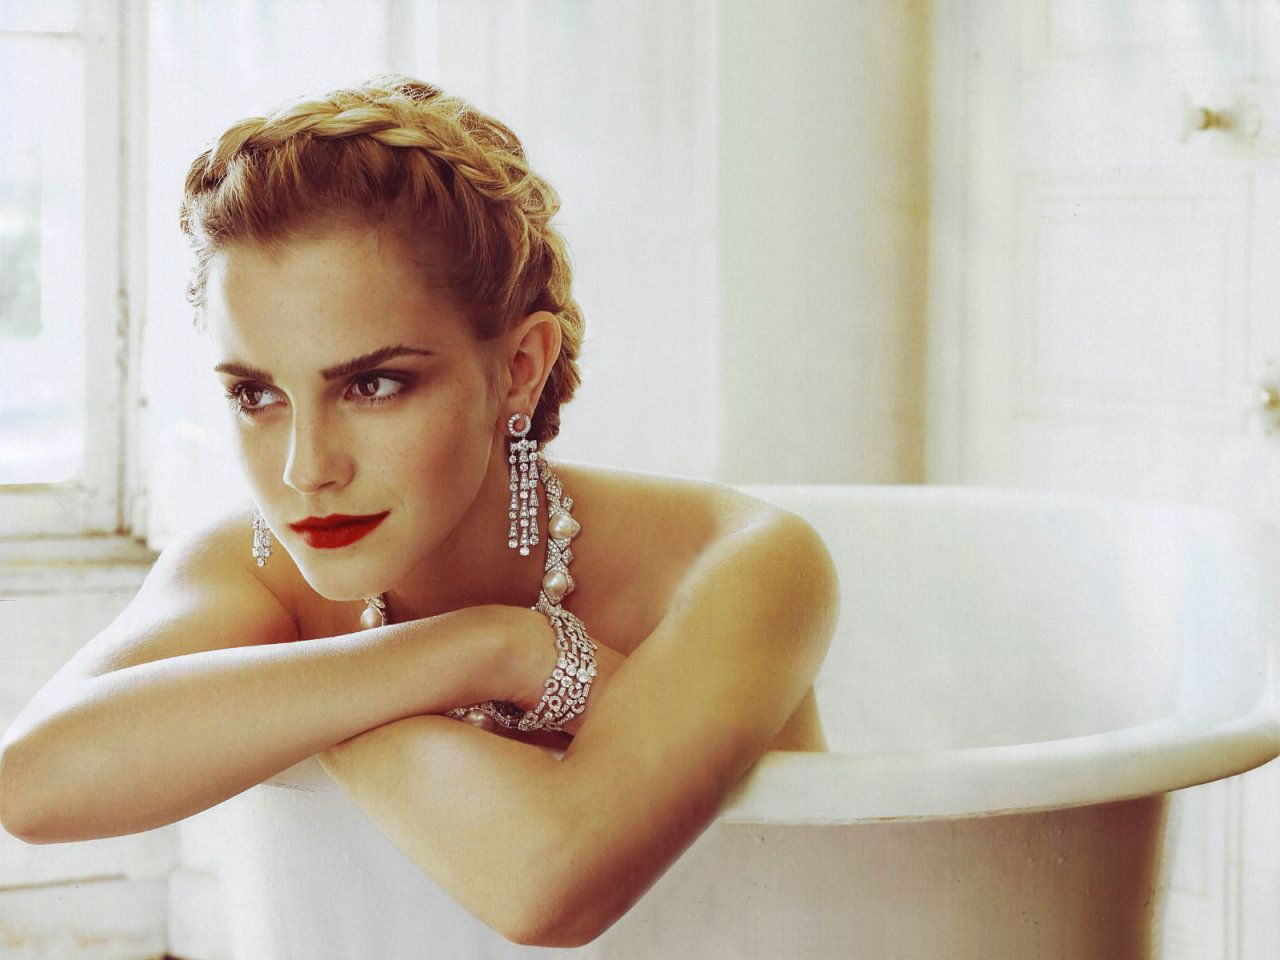 Bath emma watson Emma Watson's